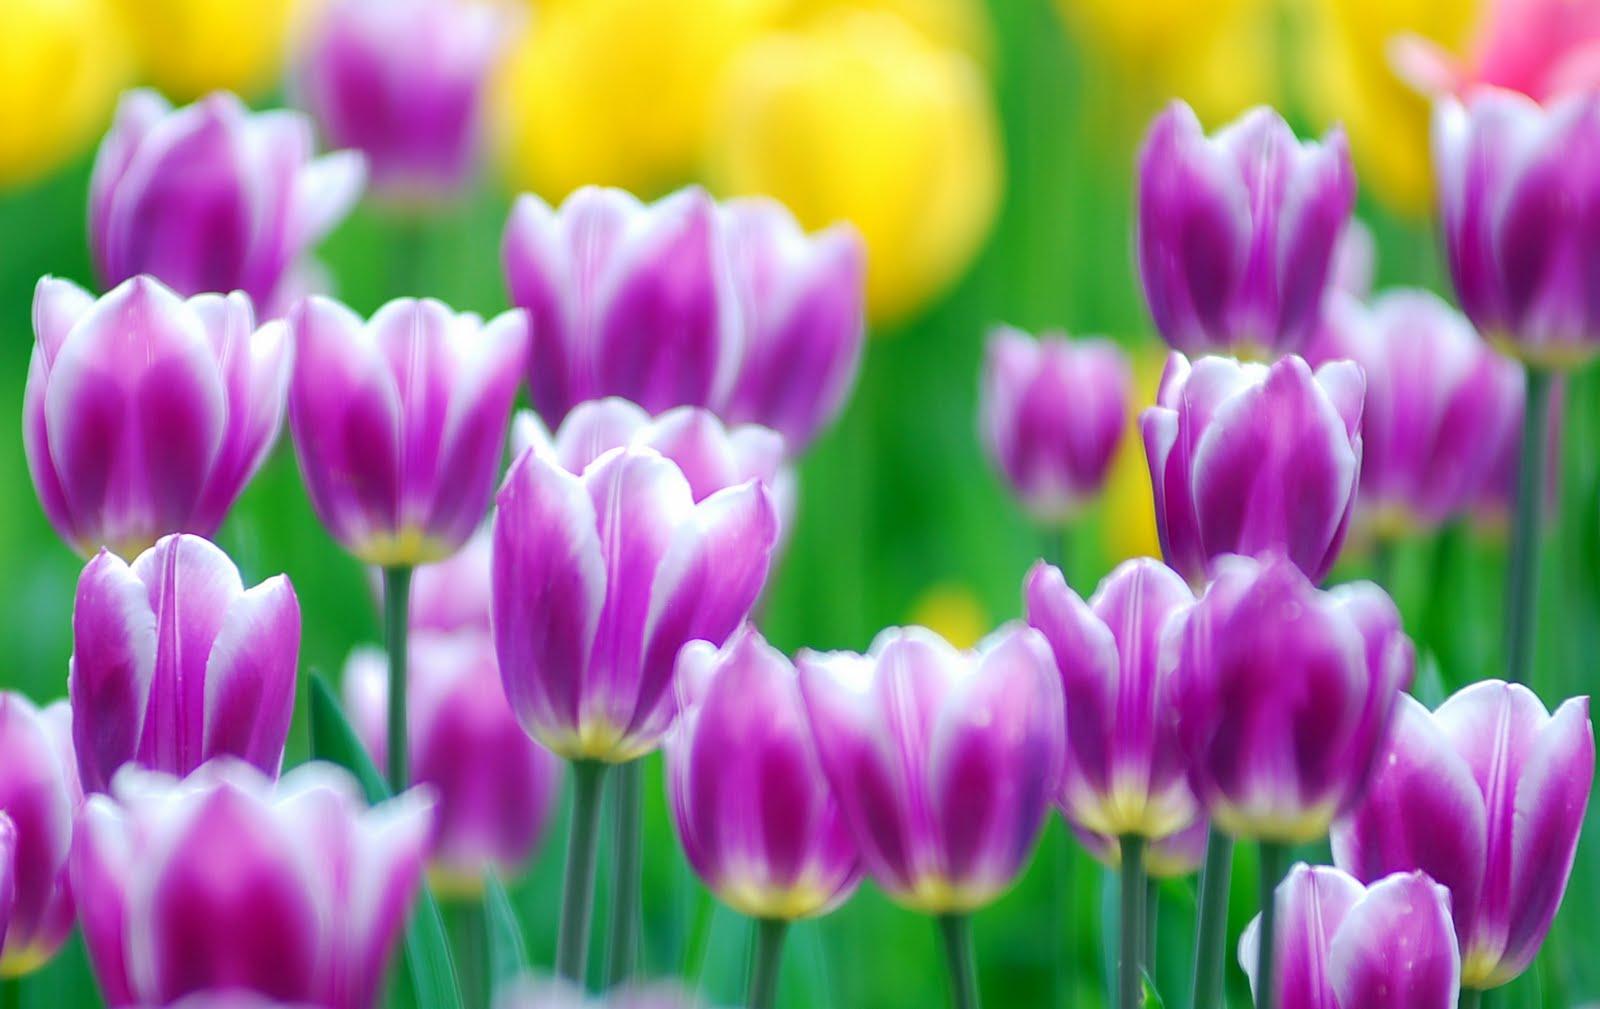 http://2.bp.blogspot.com/-f5KwuTDDJdQ/TfUYGlcMXjI/AAAAAAAAUbM/TKPNwceLuWY/s1600/Tulips-flower-wallpaper-1.jpg